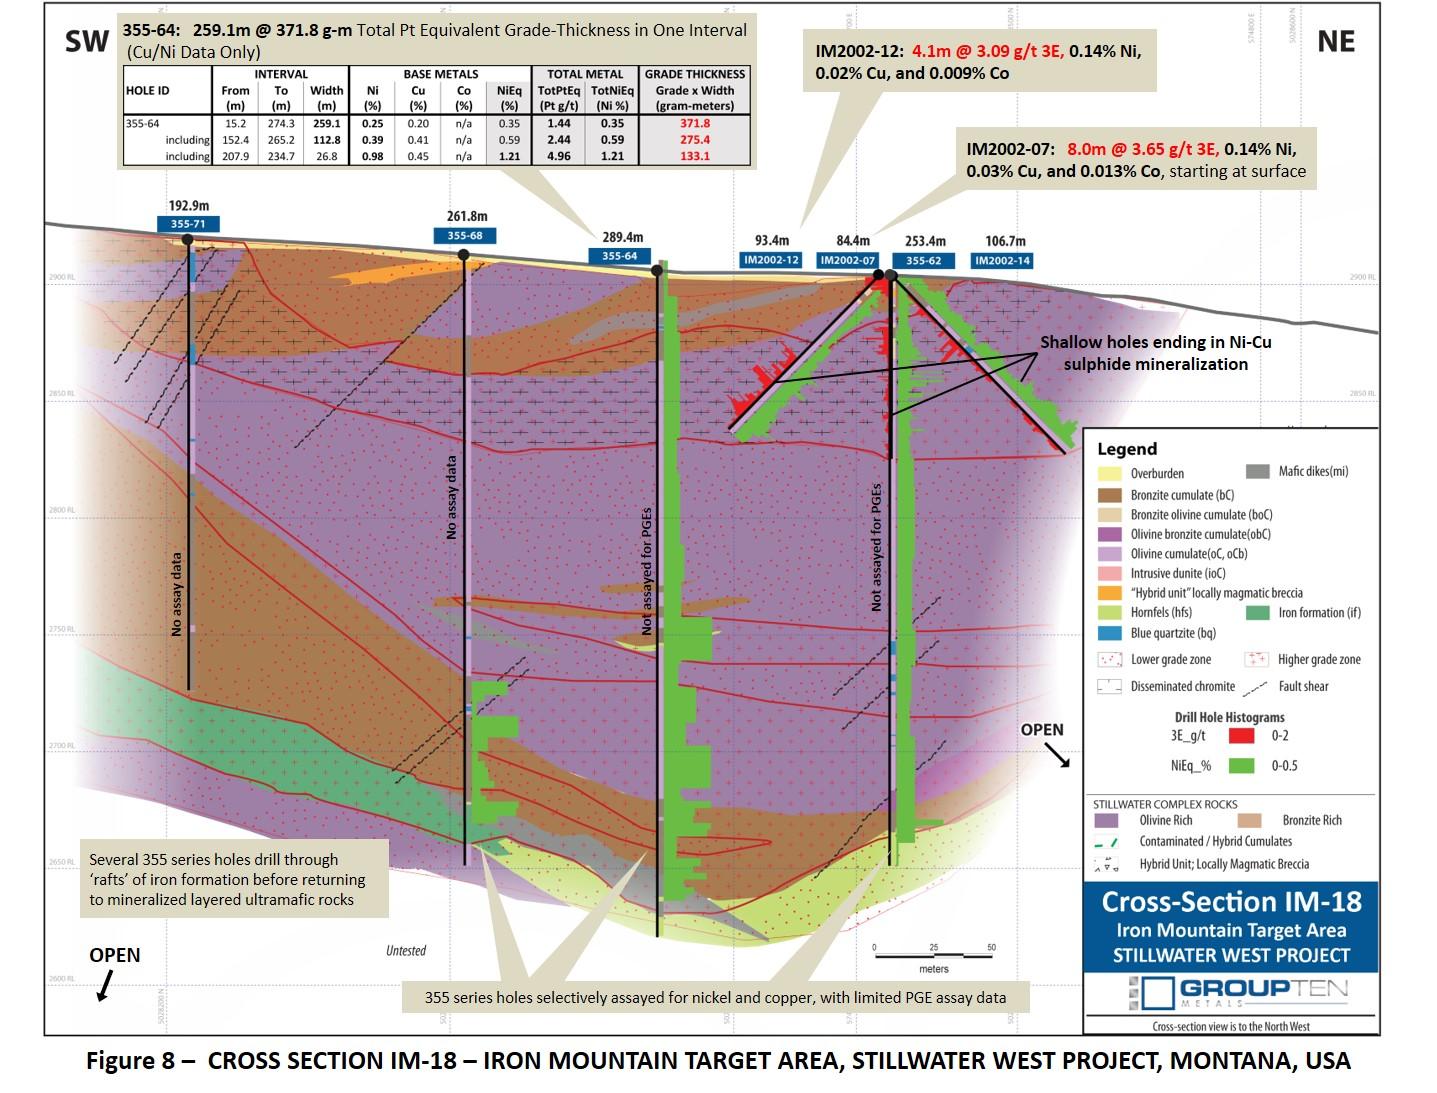 Figure 8 –  CROSS SECTION IM-18 – IRON MOUNTAIN TARGET AREA, STILLWATER WEST PROJECT, MONTANA, USA